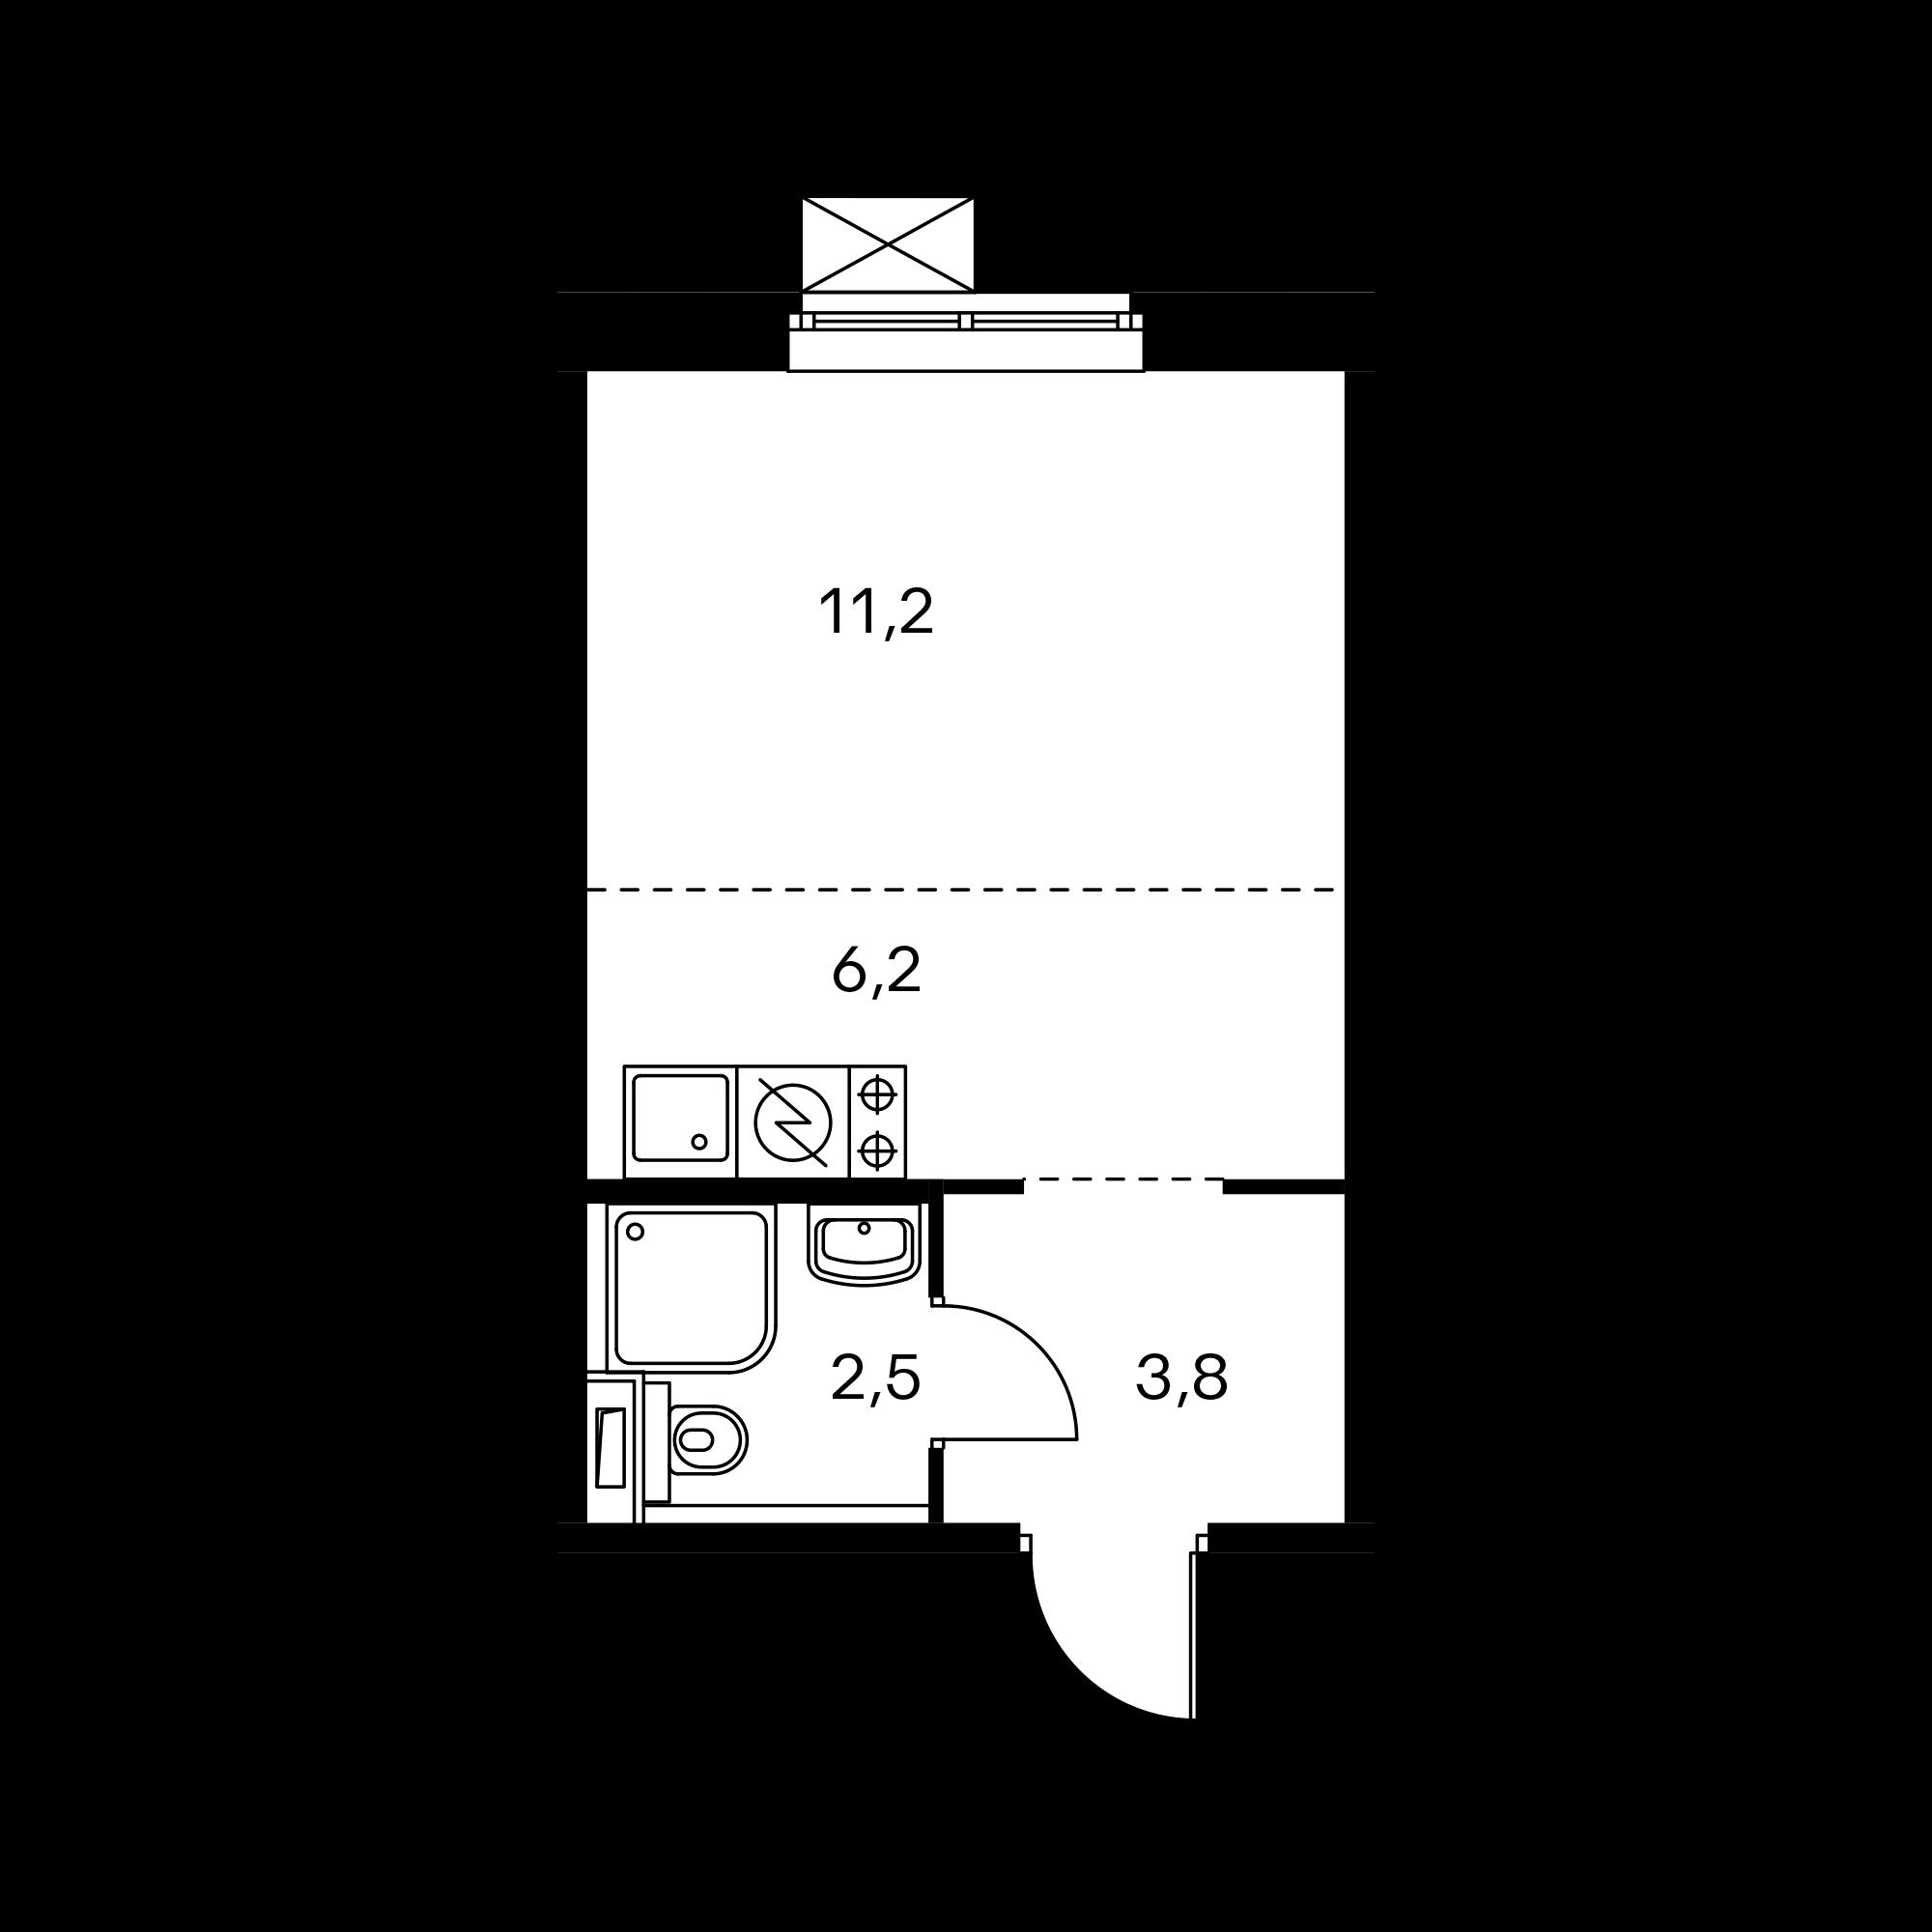 1NS1_4.2-4